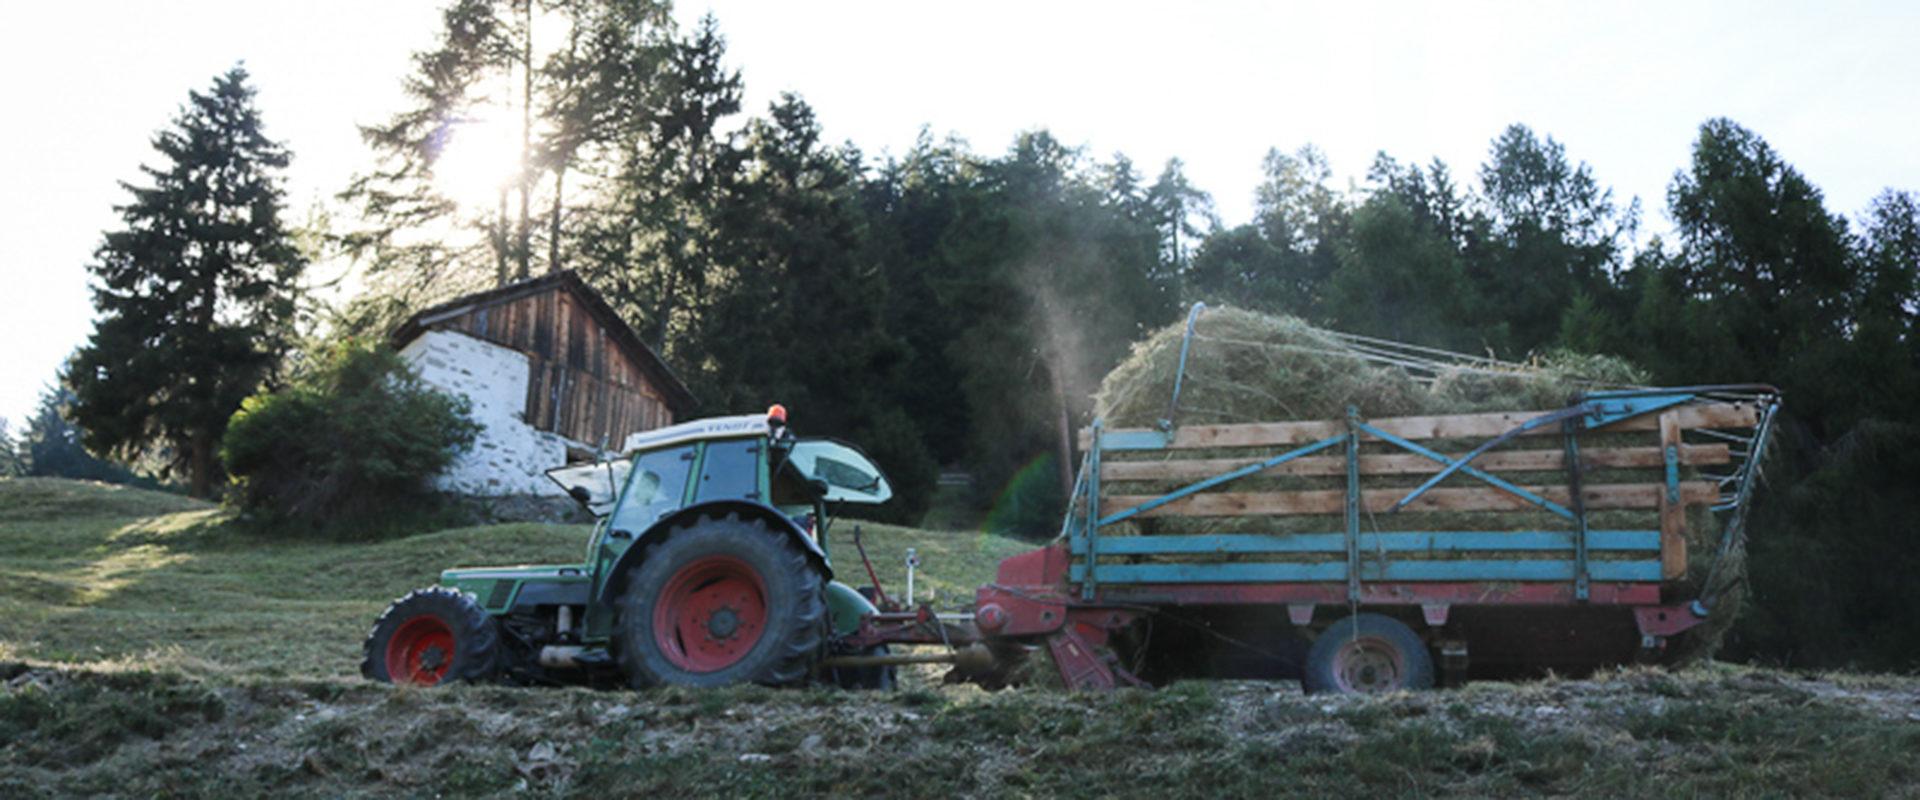 Bergbauernhilfe Traktor